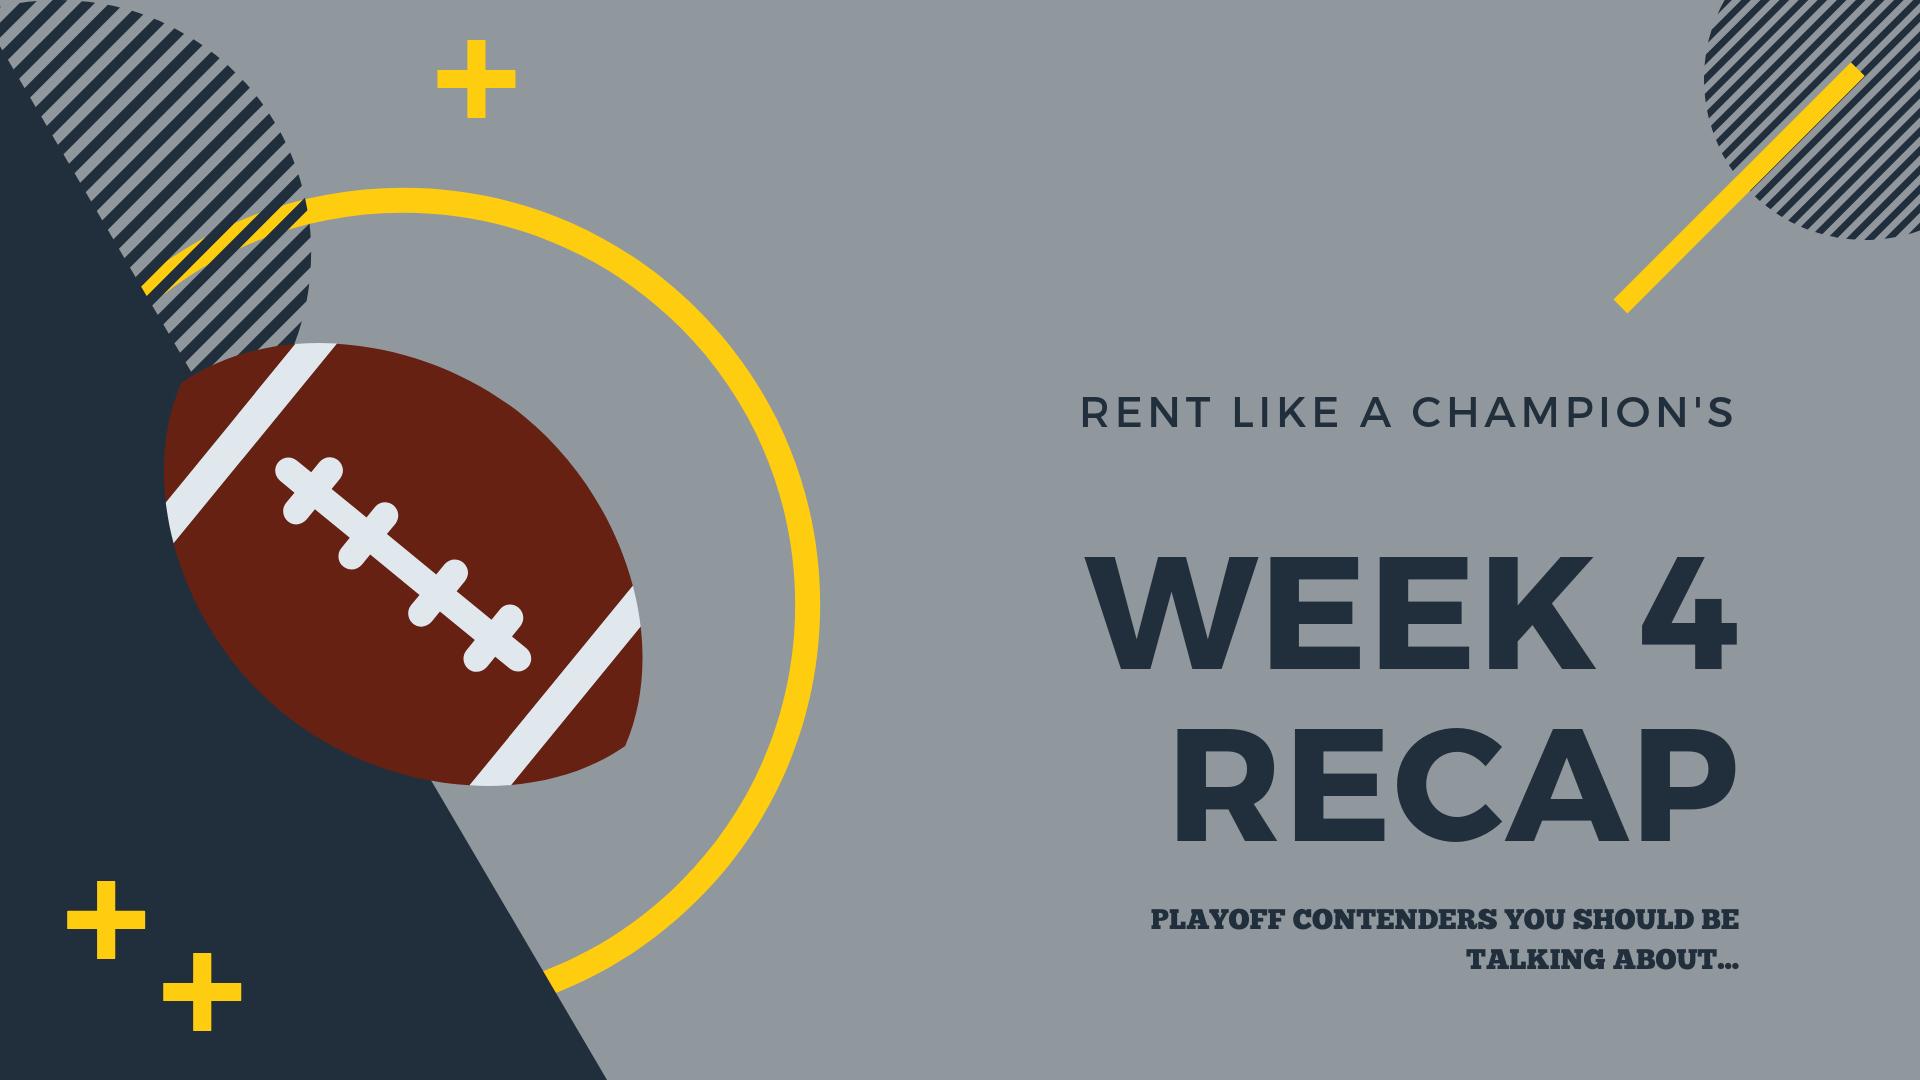 Week Recap Template (2)